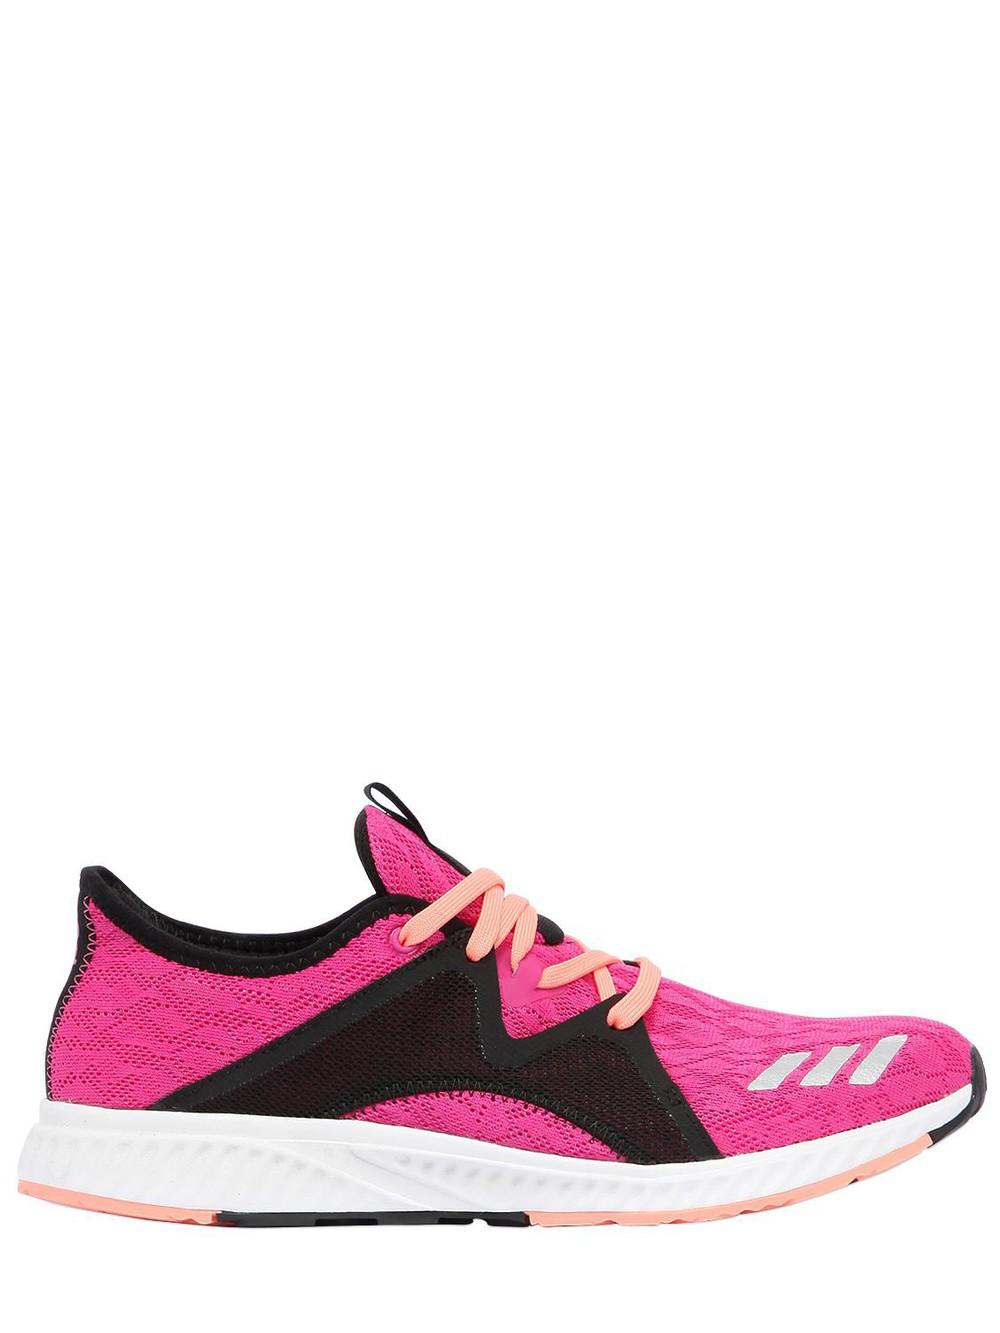 ADIDAS PERFORMANCE Edge Lux 2 Air Mesh Sneakers in black / fuchsia